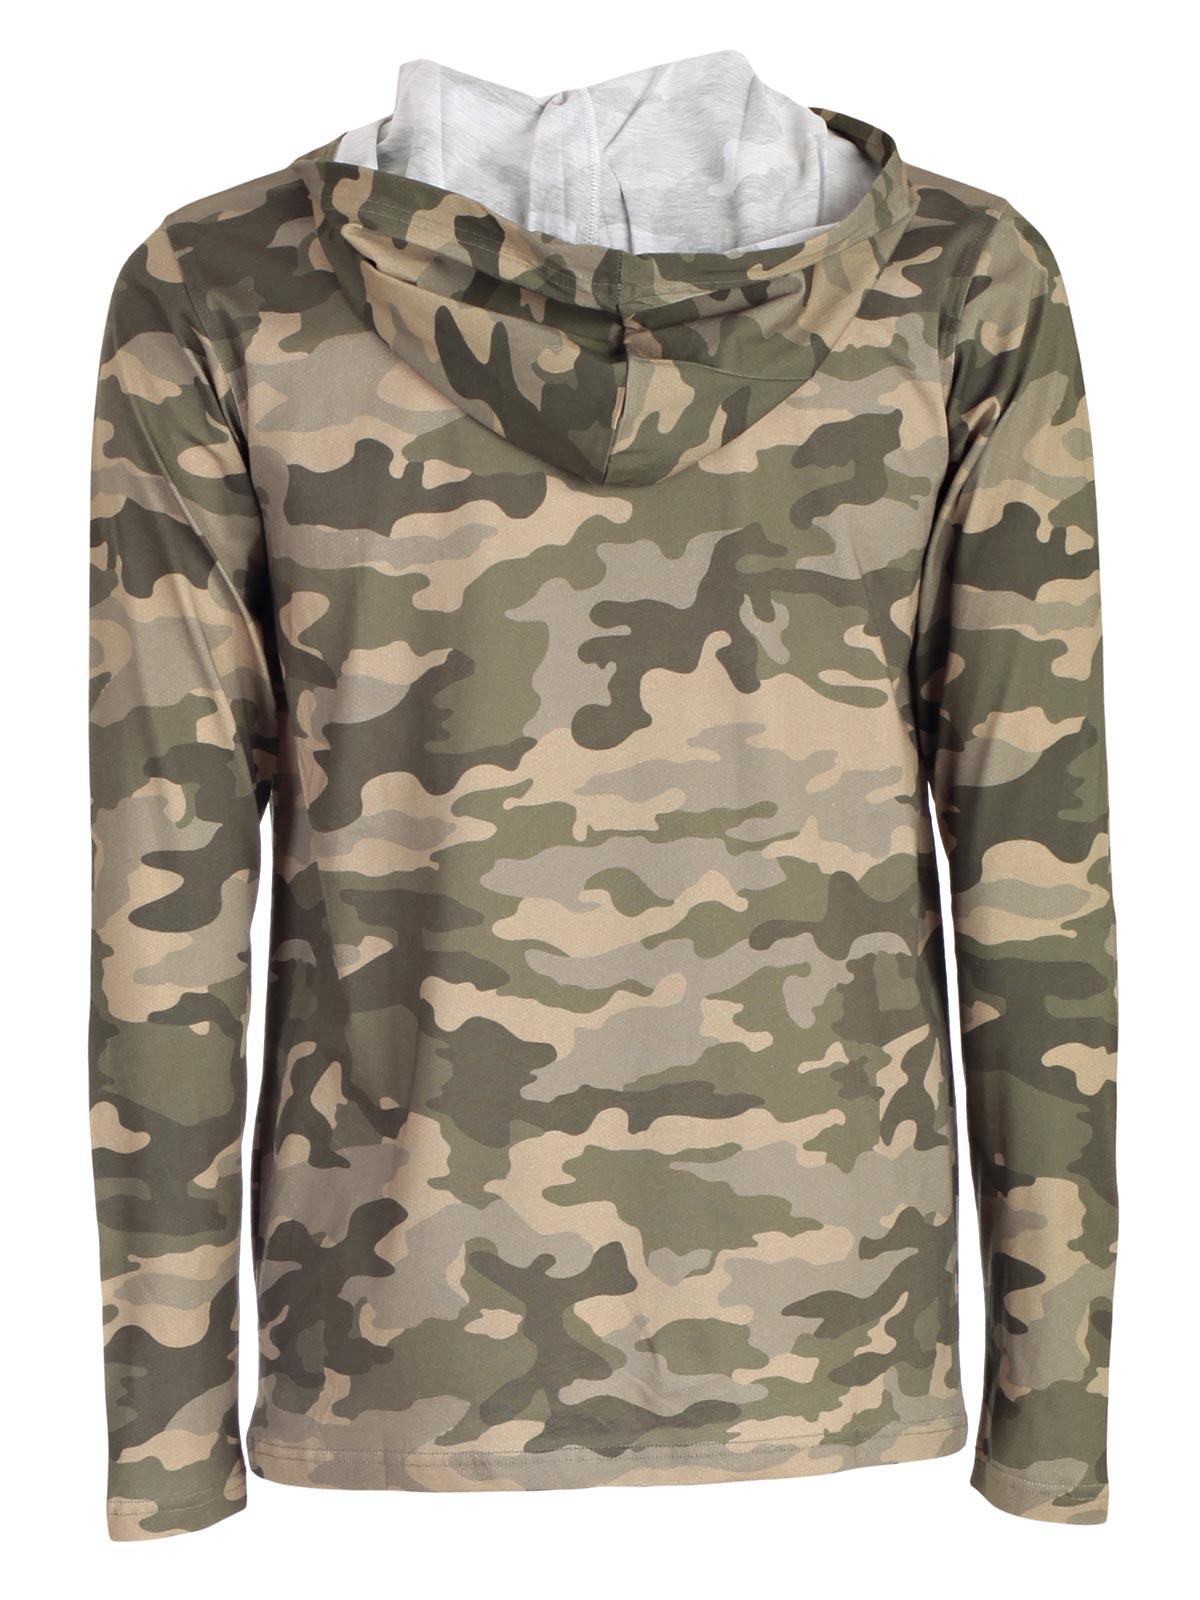 54c04d0a Balmain T-Shirt W7H8006I039M - 187 CAMOUFLAGE.Bernardelli Store ...